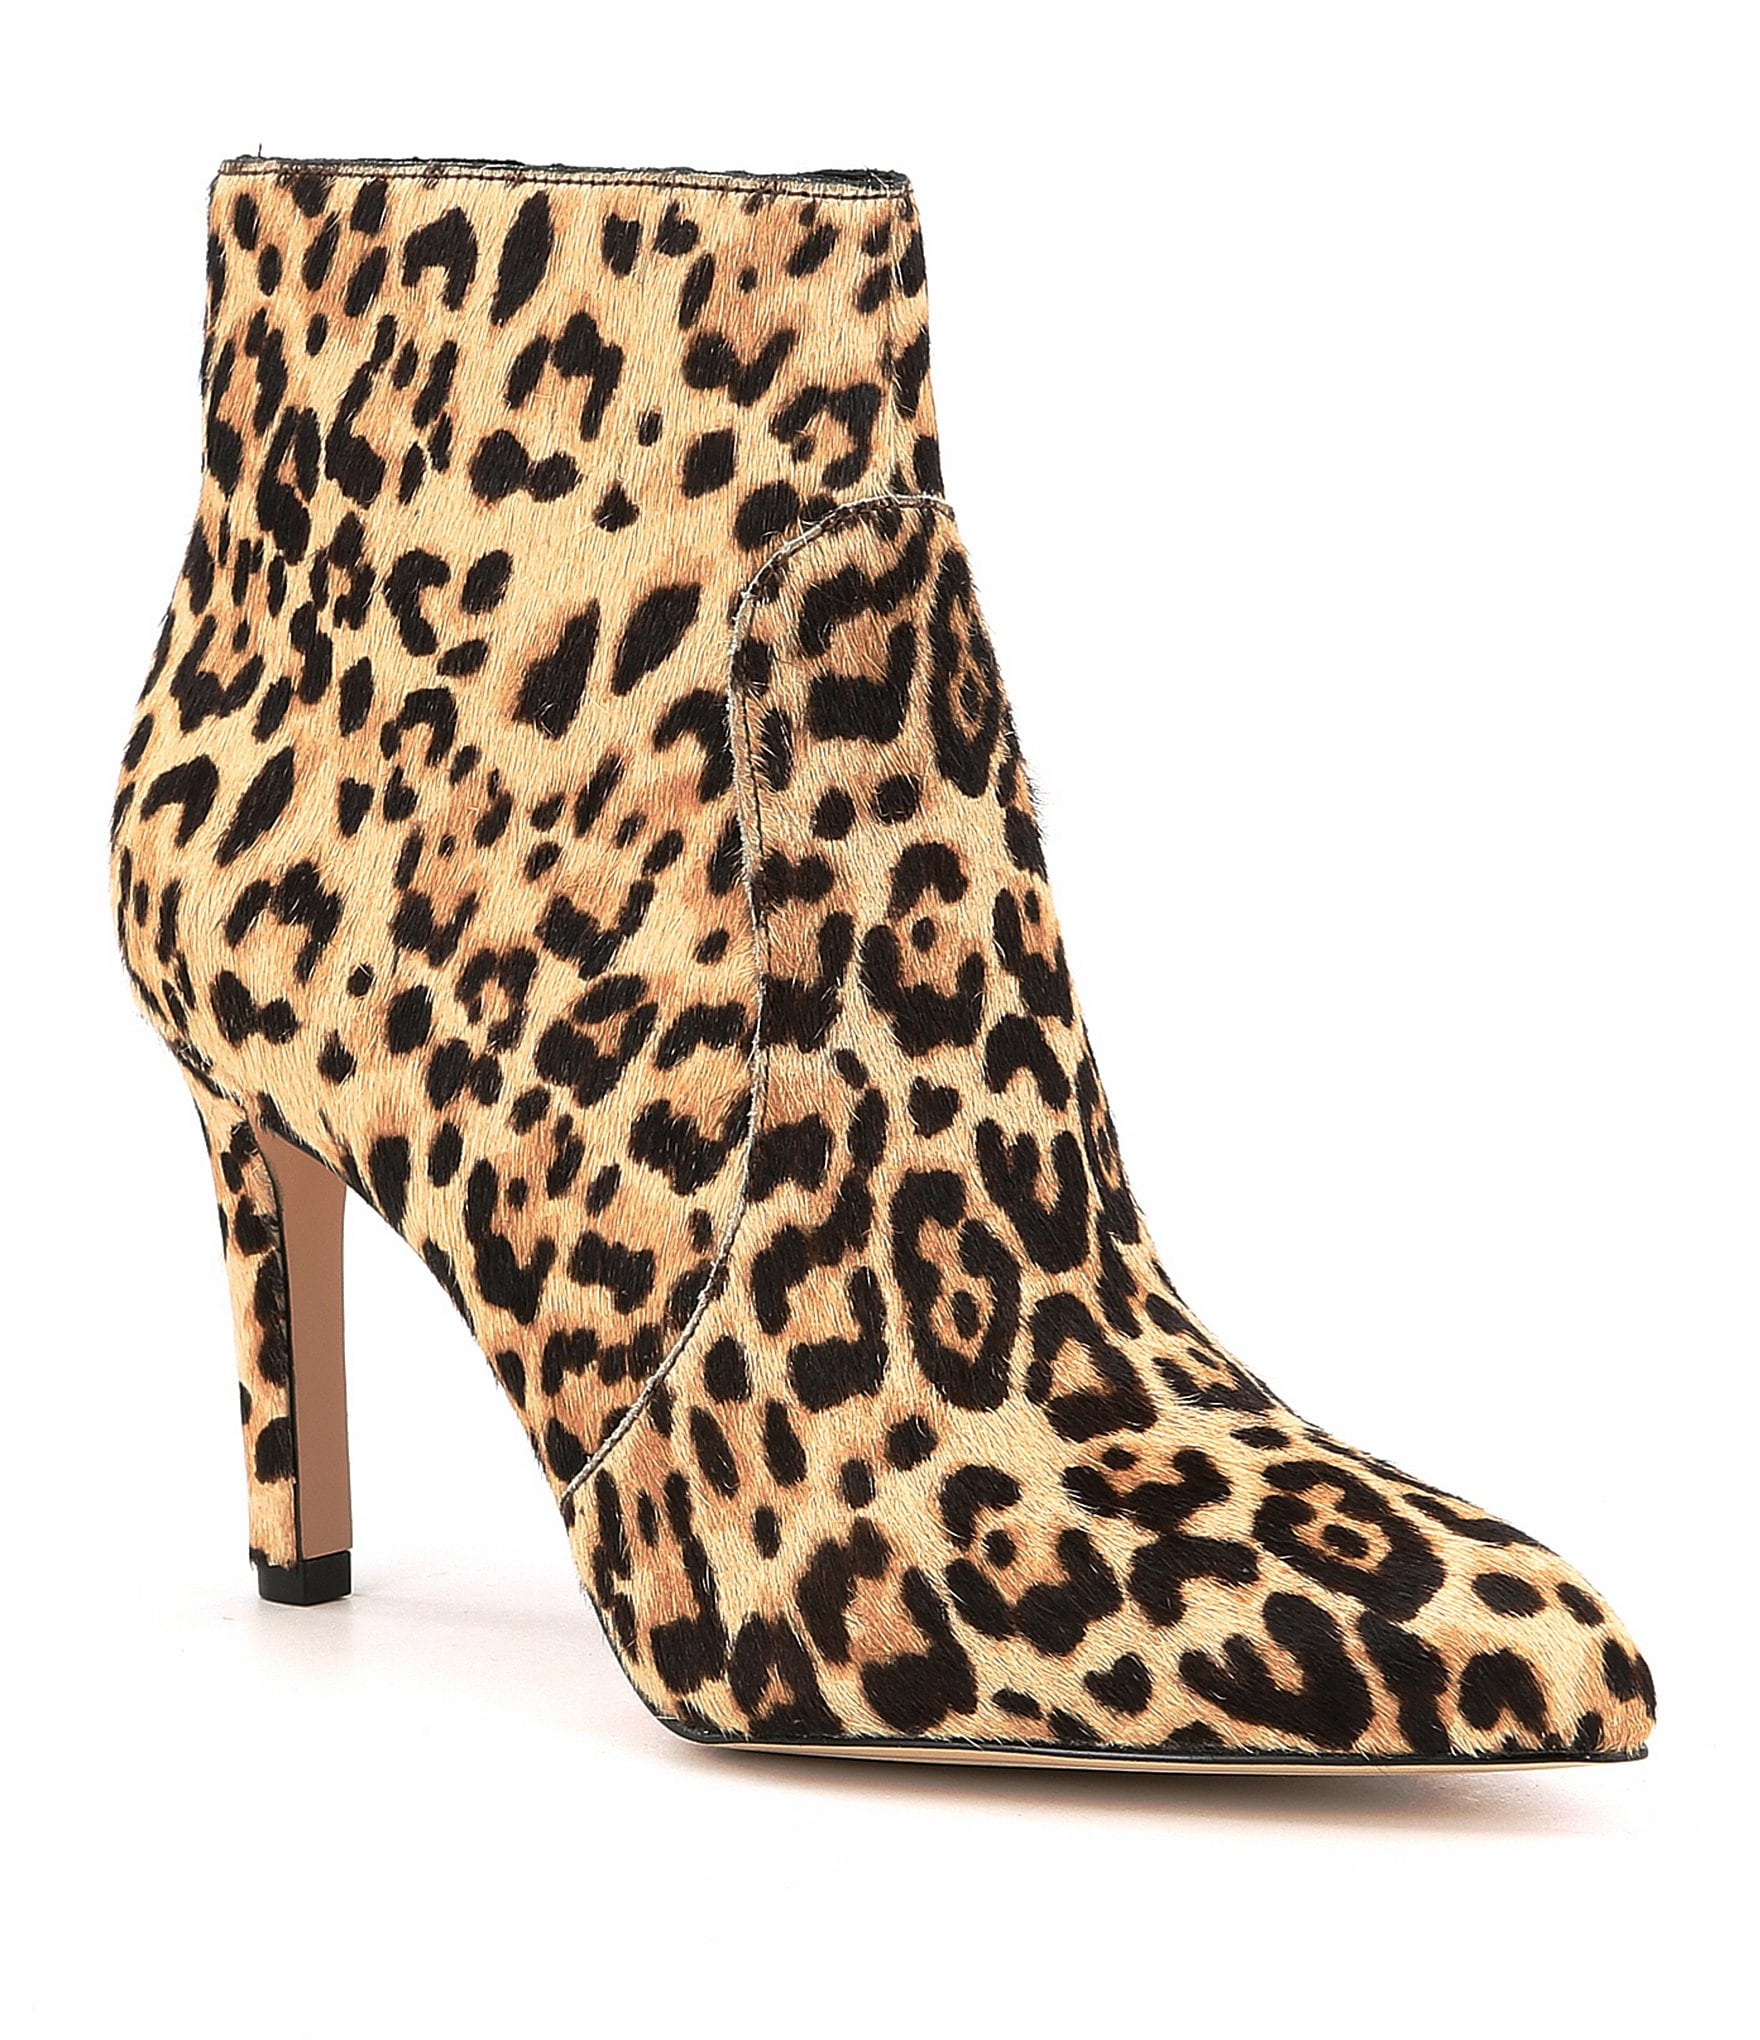 5c824fb2d ... Ankle Boots Lyst. Sam Edelman Edith At Zos. Sam Edelman Blake Leopard  Print ...